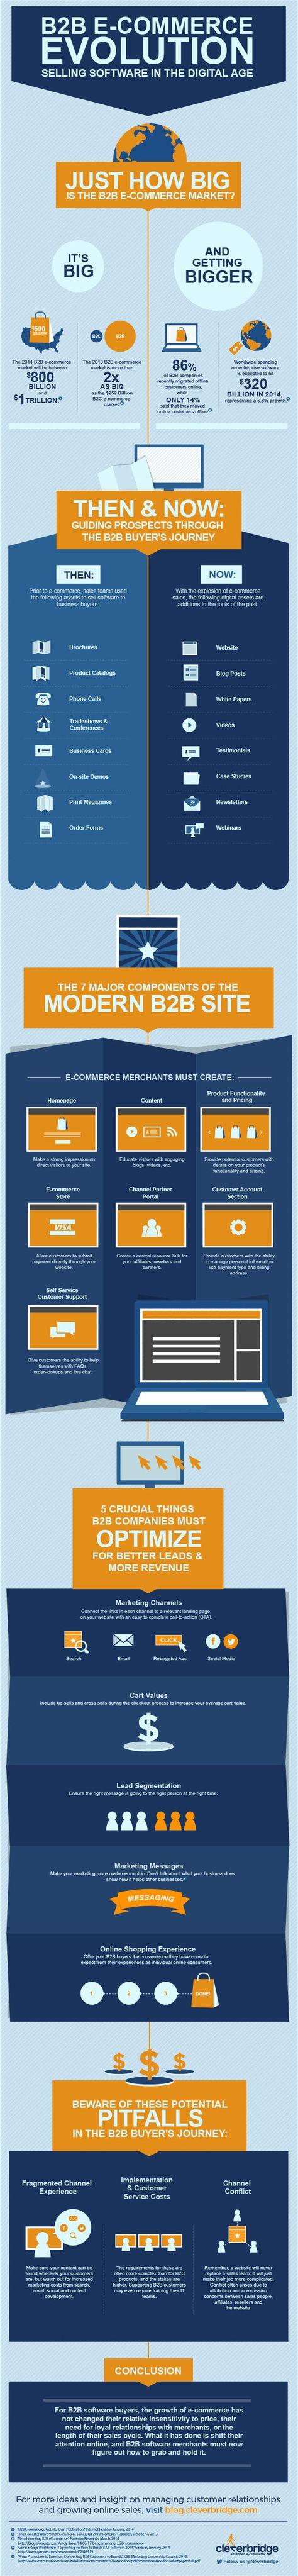 B2B E-Commerce Evolution: Selling Software in the Digital Age - #entrepreneur #startups